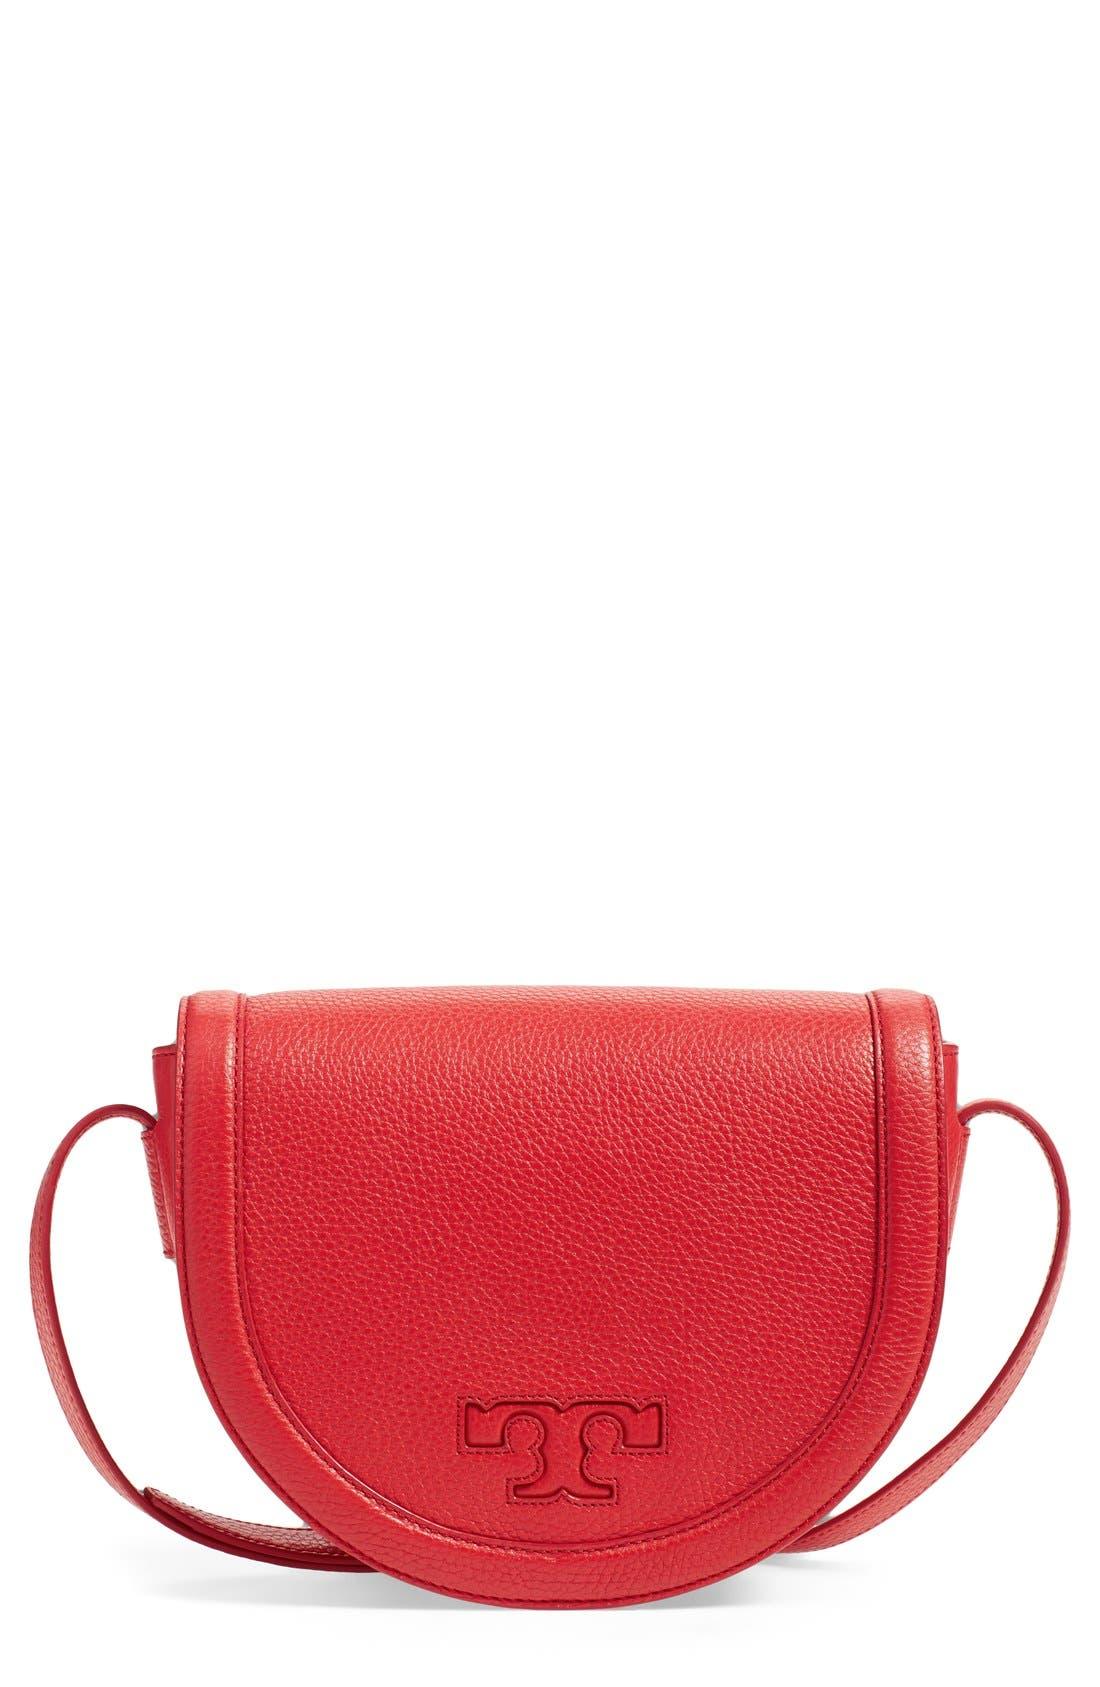 Alternate Image 1 Selected - Tory Burch 'Serif T' Leather Saddle Bag